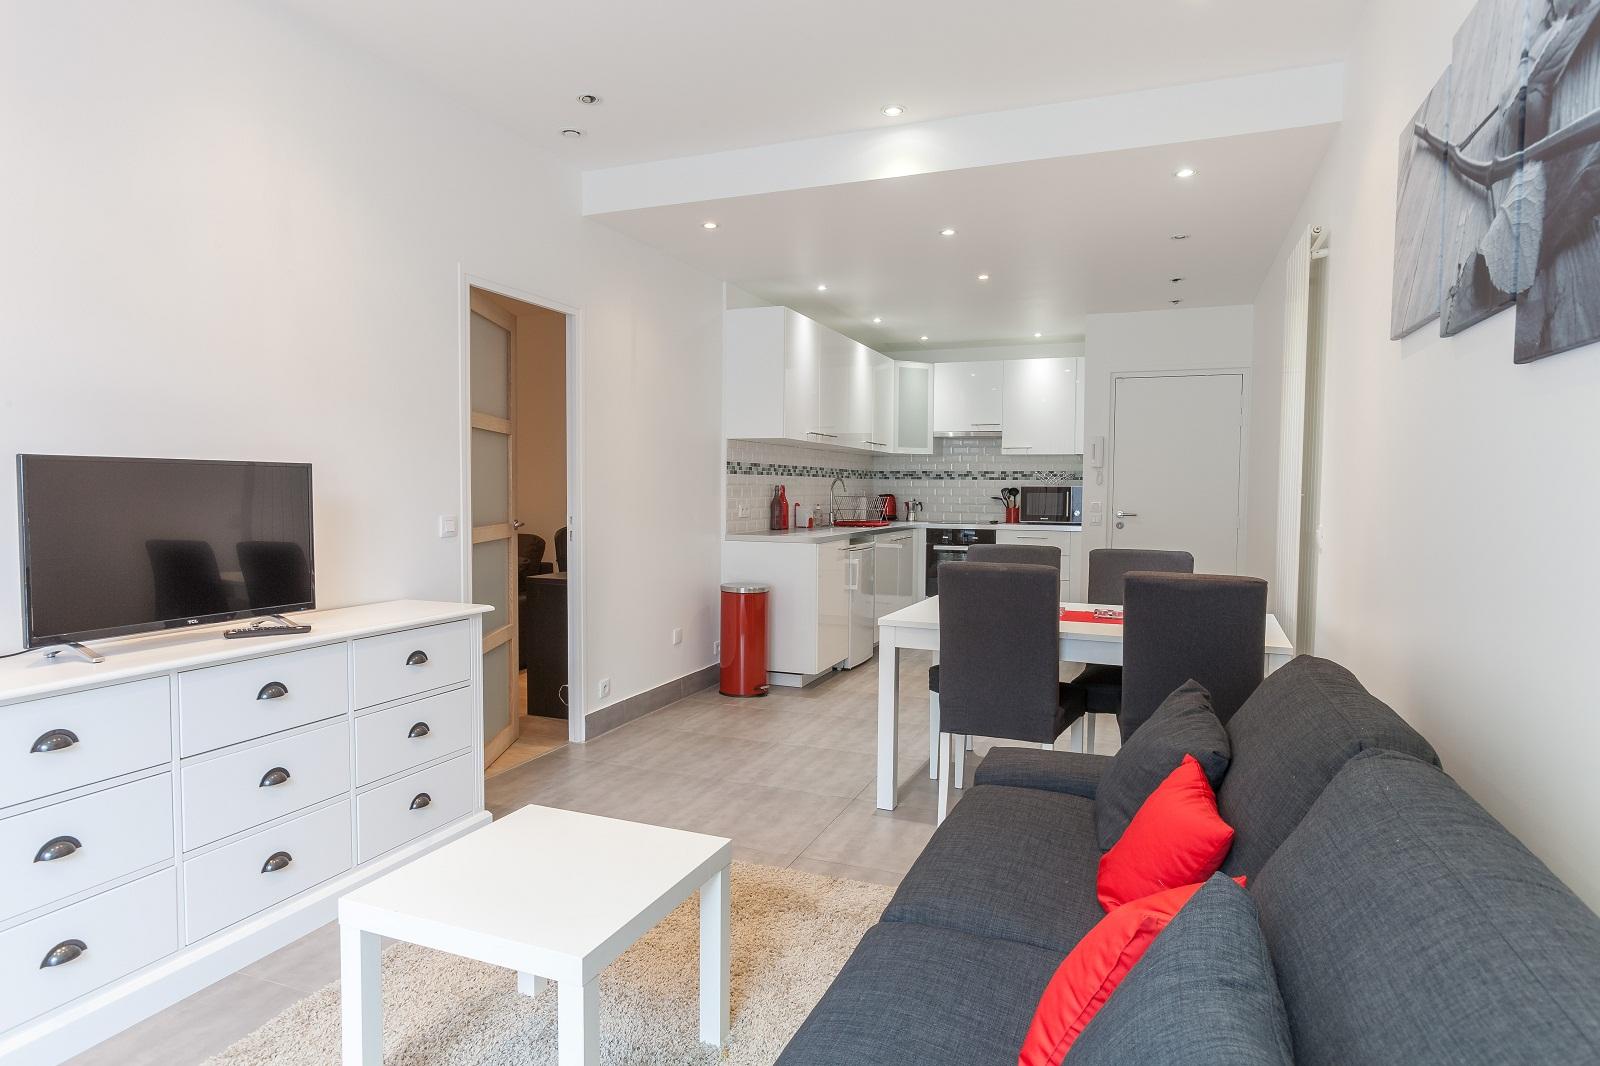 Appart Hotel Clamart - Airbnb Paris - Residence Services Malakoff - Appartement équipé Boulogne Billancourt